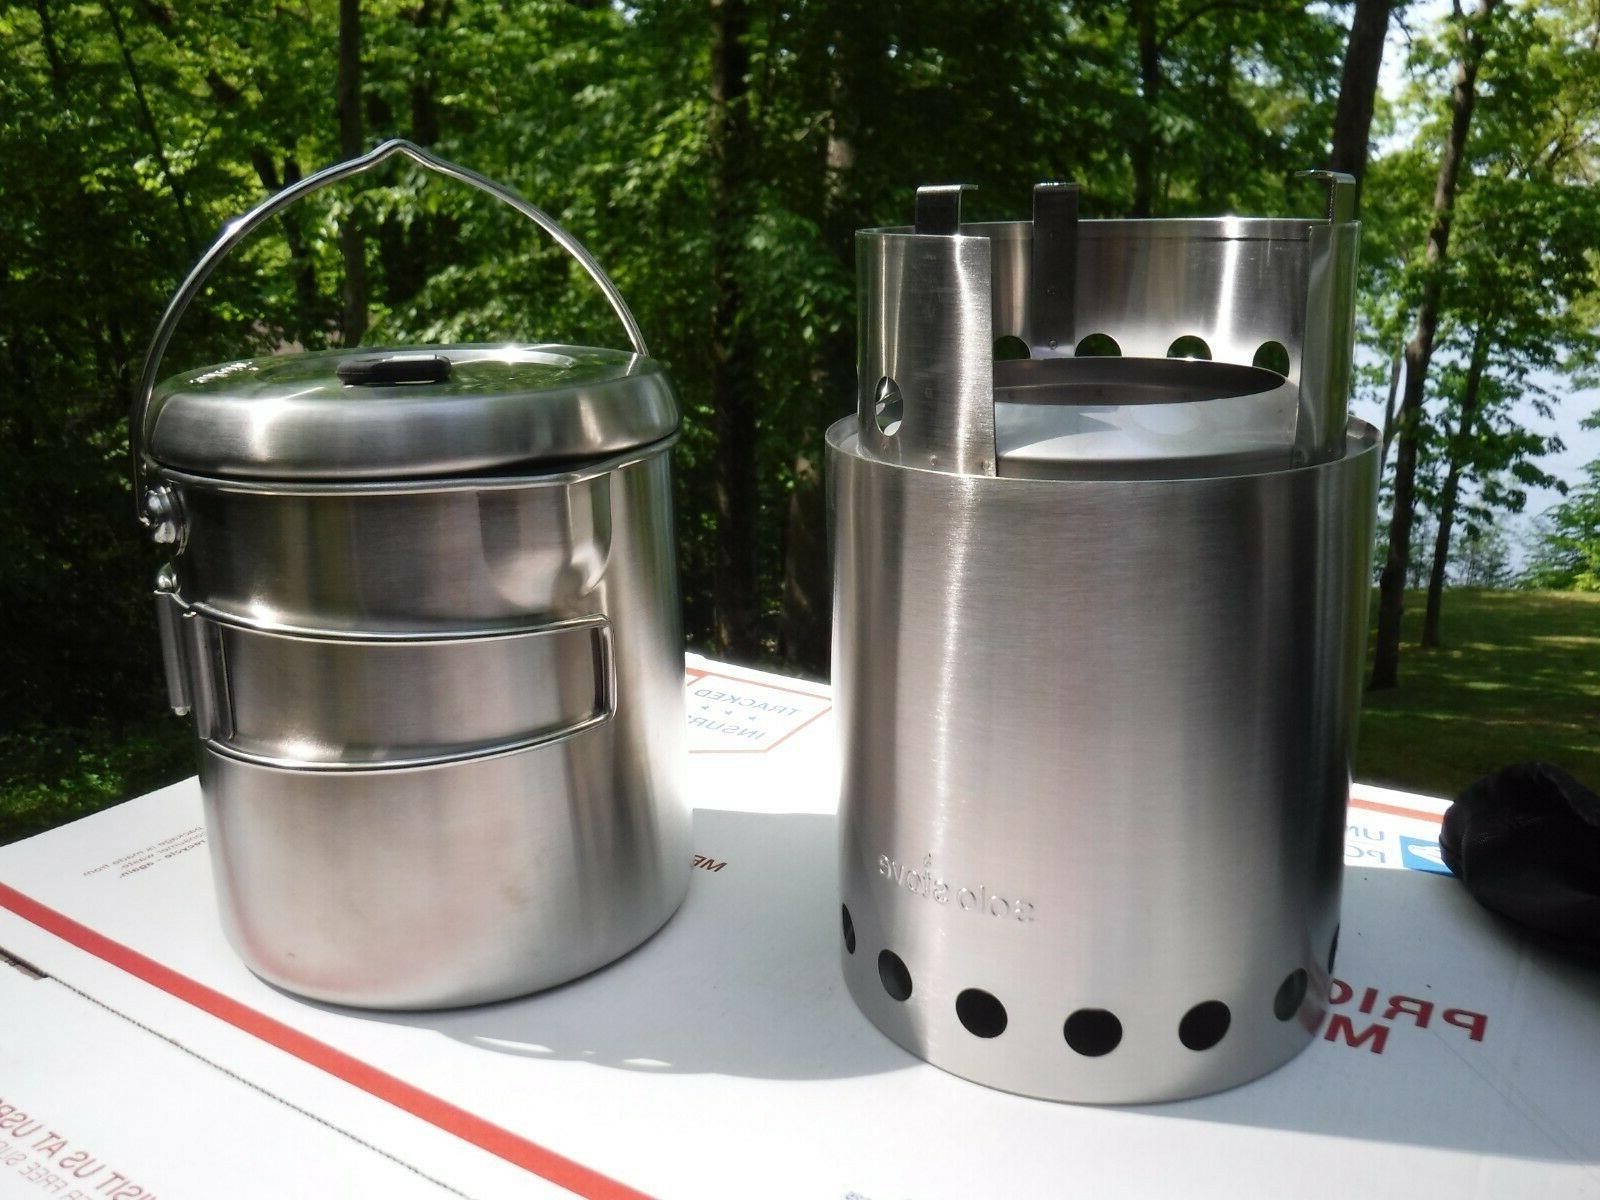 new titan and solo pot 1800 wood